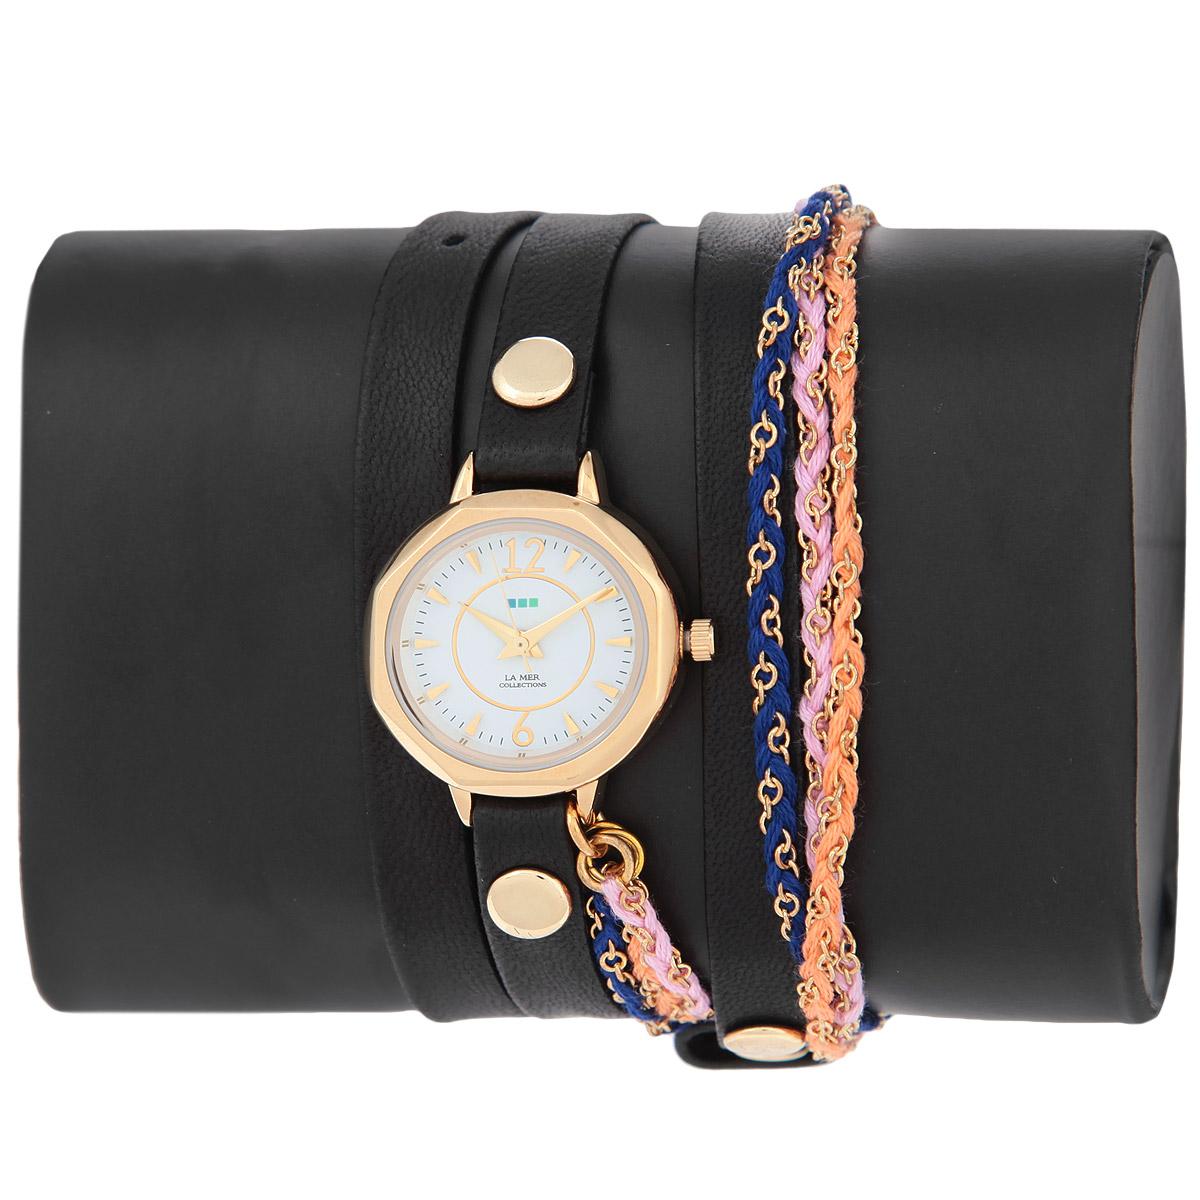 "Часы наручные женские La Mer Collections ""Sydney Friendship Bracelet Gold"". LMDEL1004 ( LMDEL1004 )"